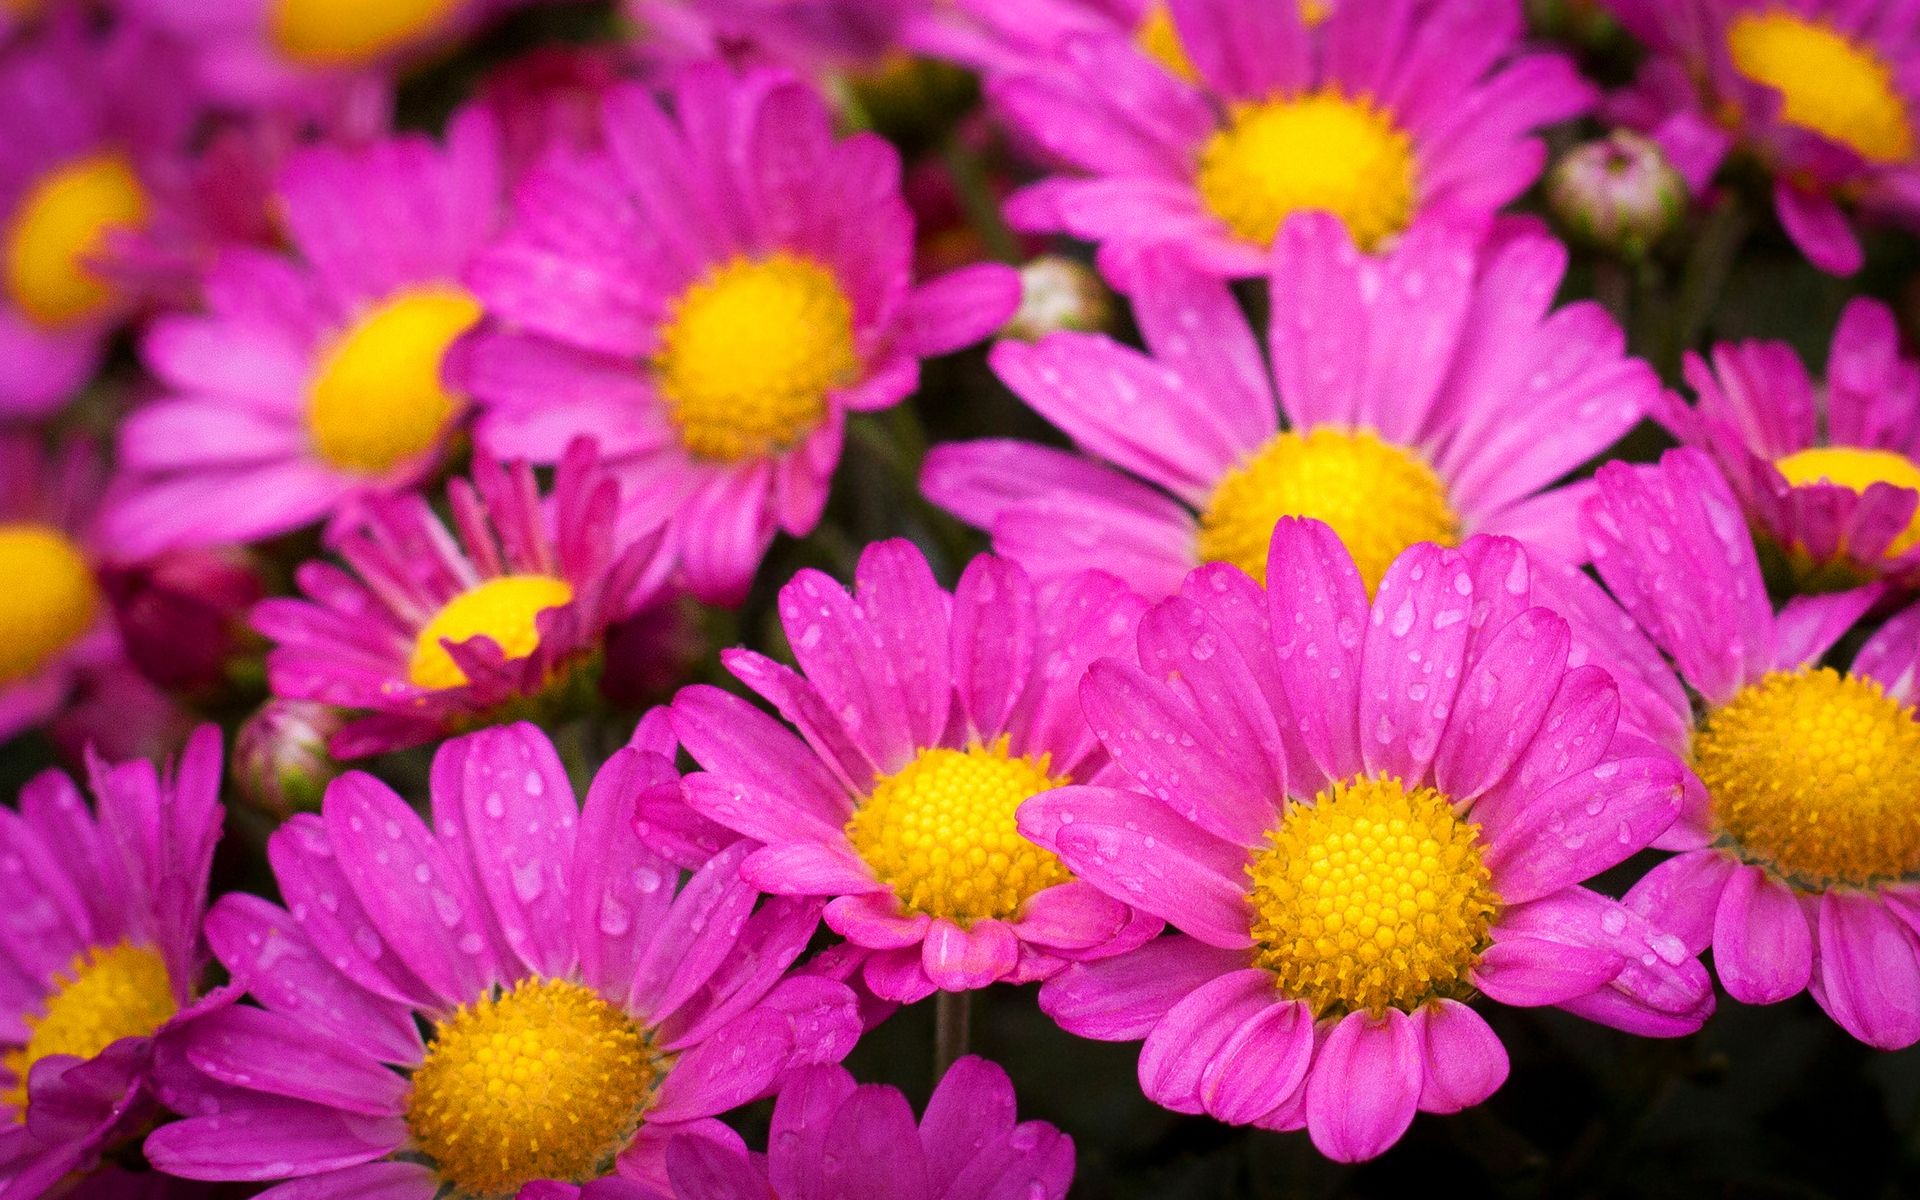 Beautiful Pink Flowers 19329 1920x1200 Px Hdwallsource